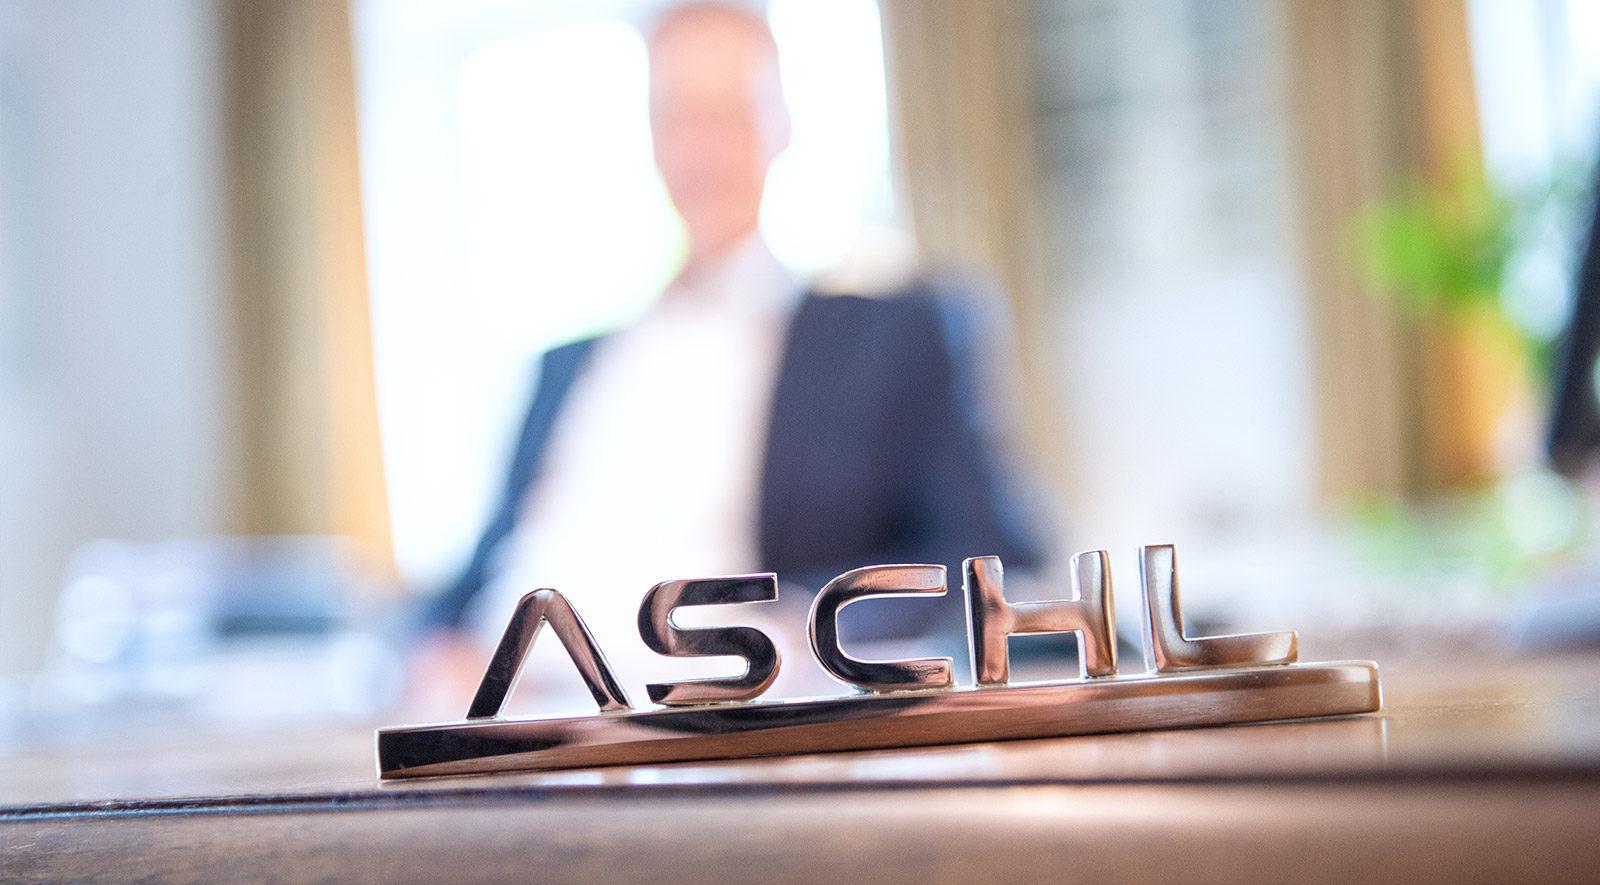 ASCHL - Leitbild